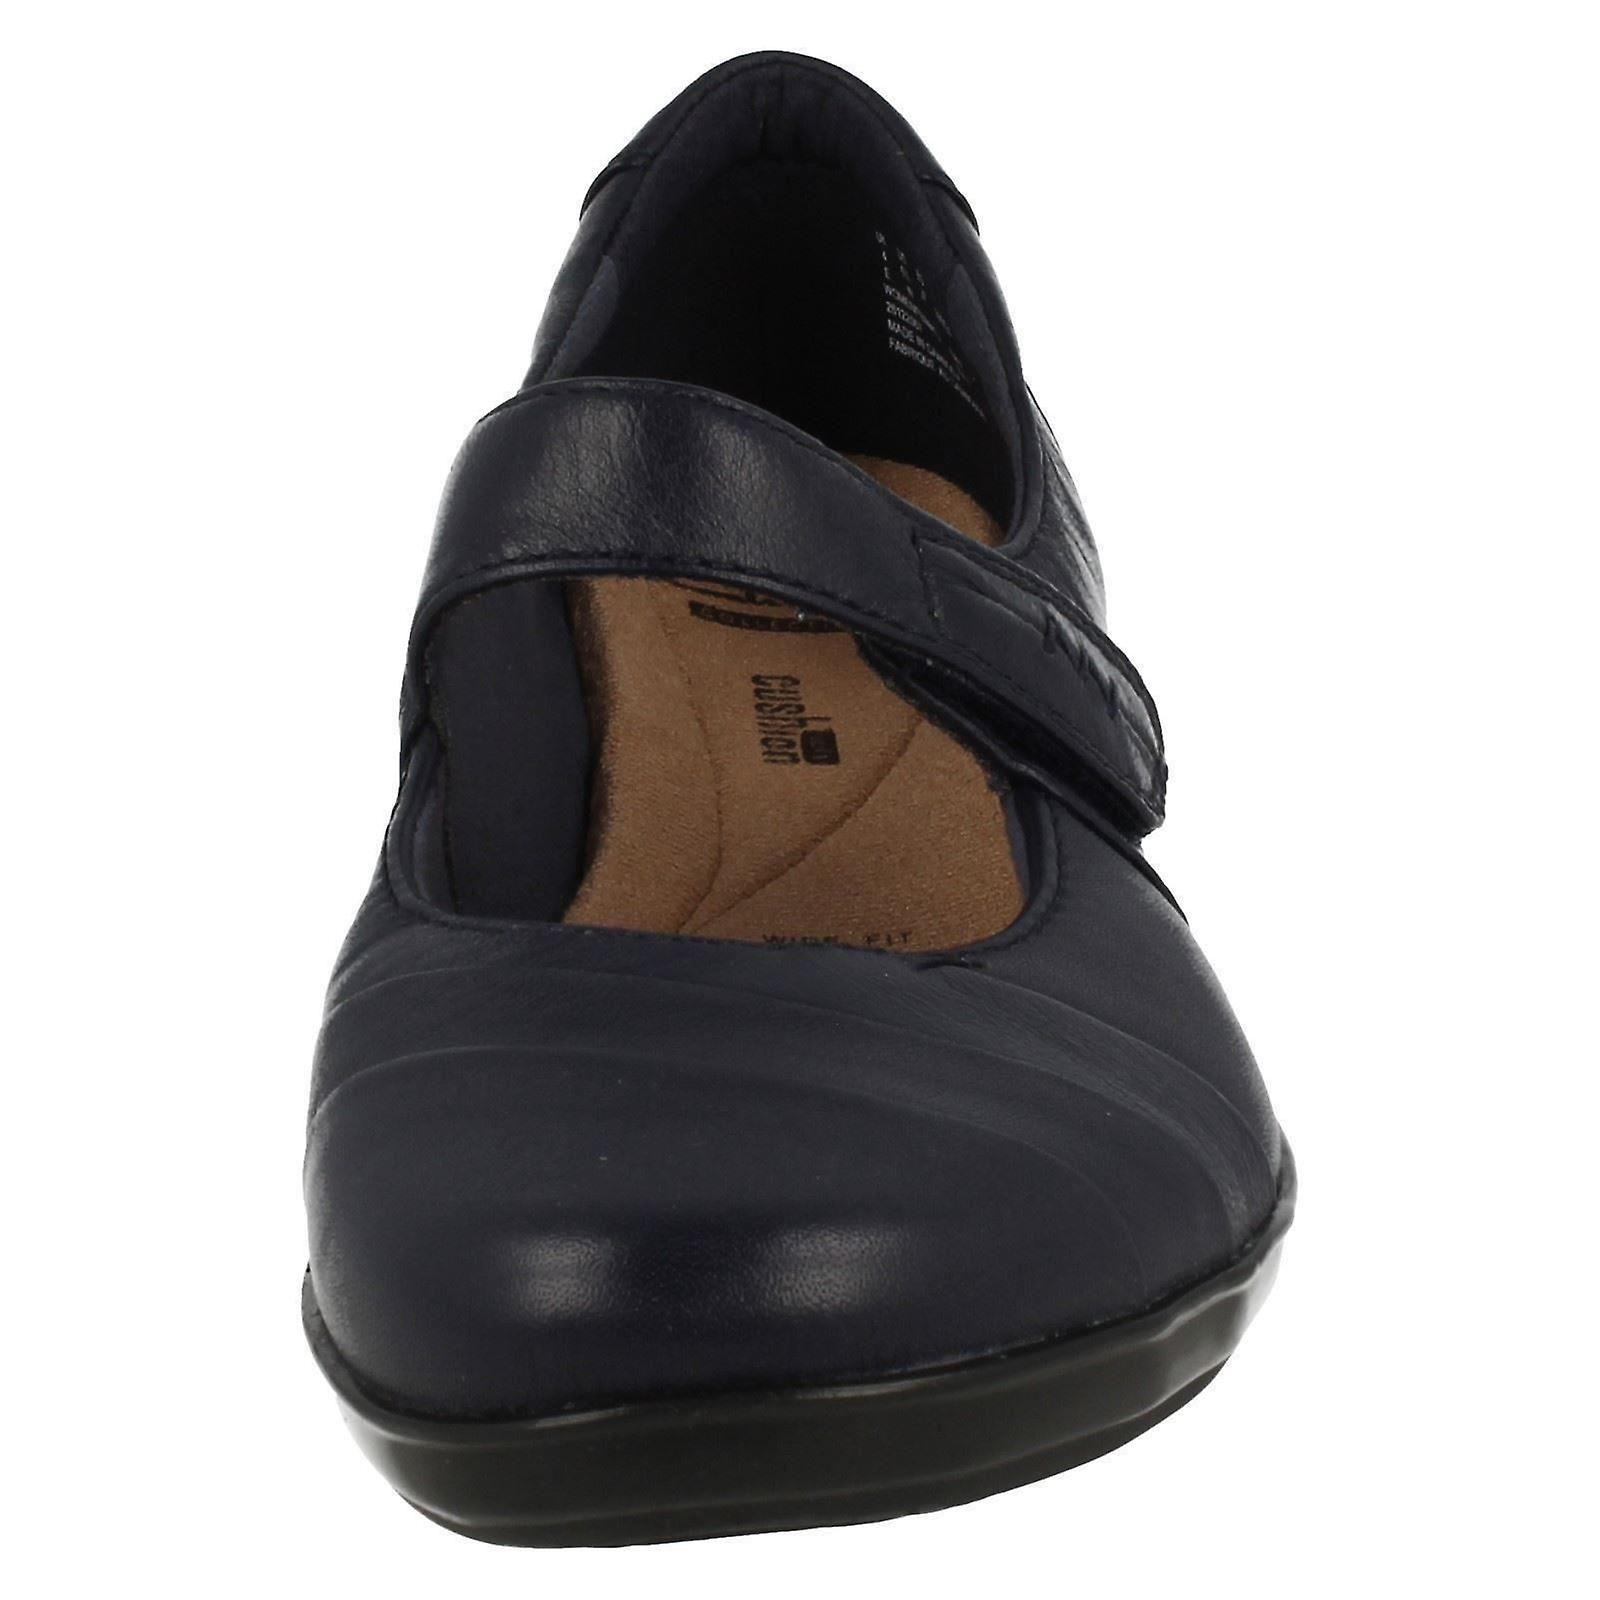 Signore clarks cuscino morbido morbido morbido intelligente scarpe everlay kennon | Acquista online  ee9035